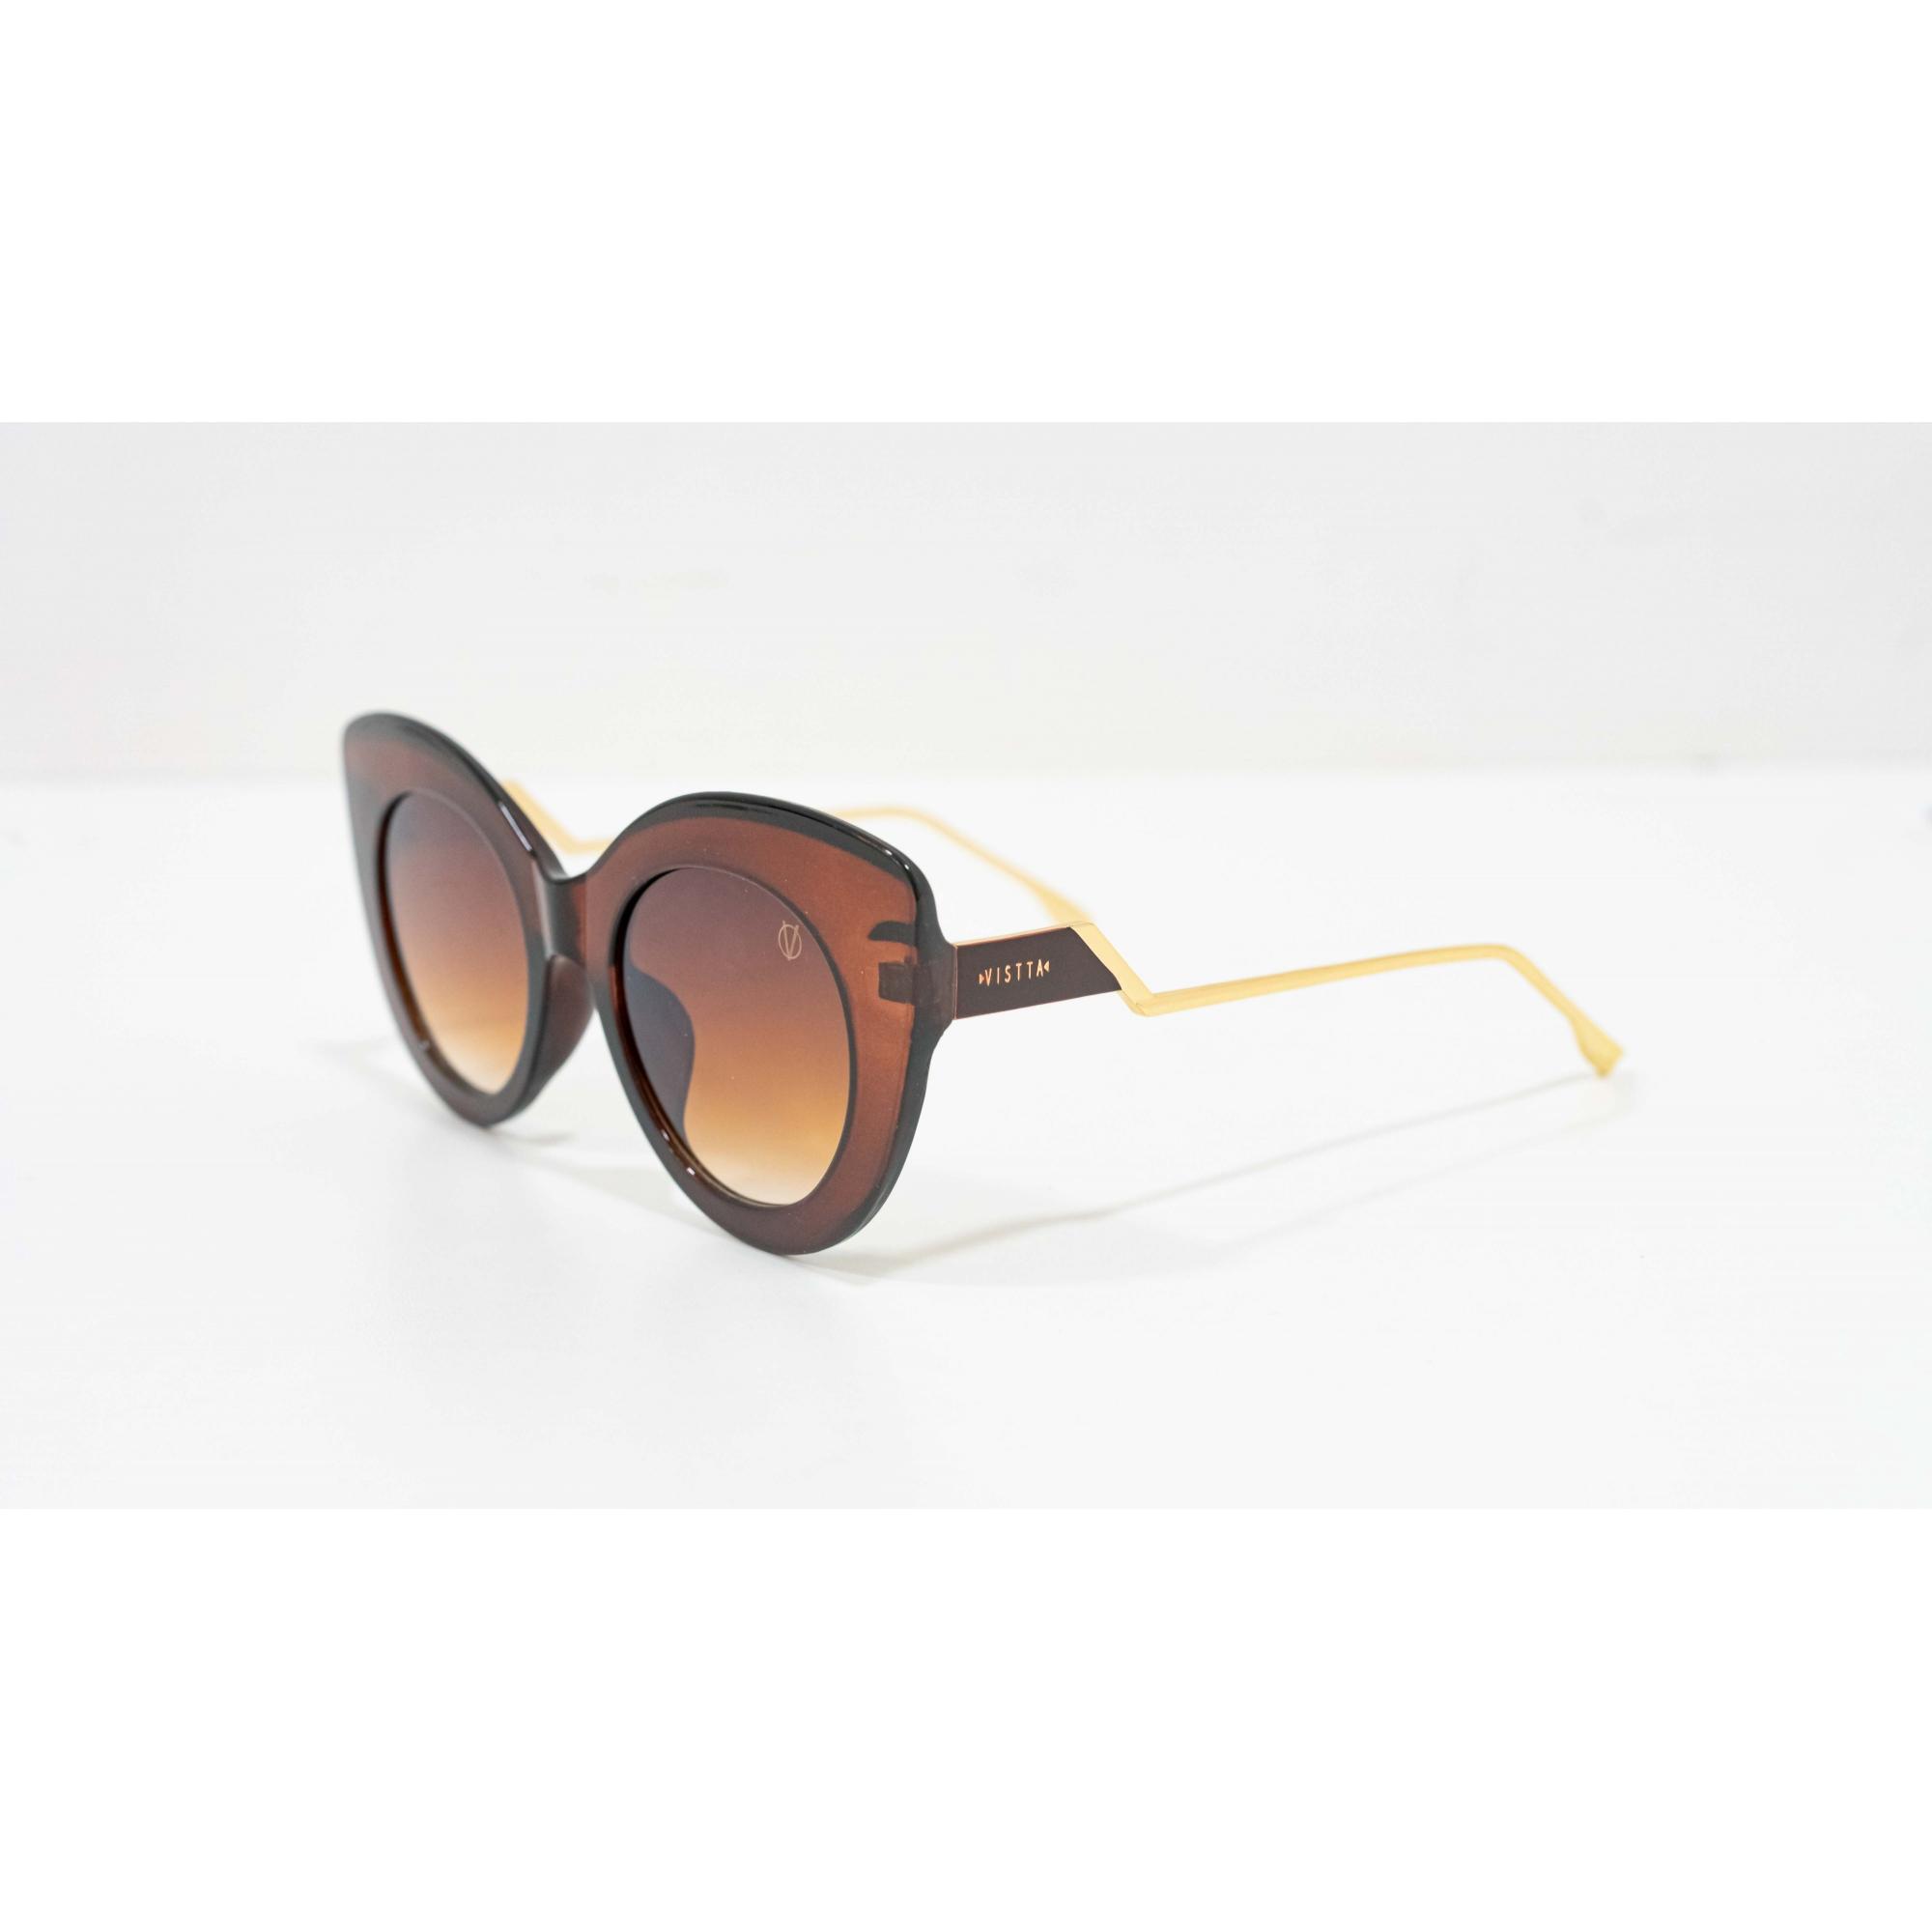 Óculos Vistta Aping Cat Eye HX6502 C3 56 Marrom